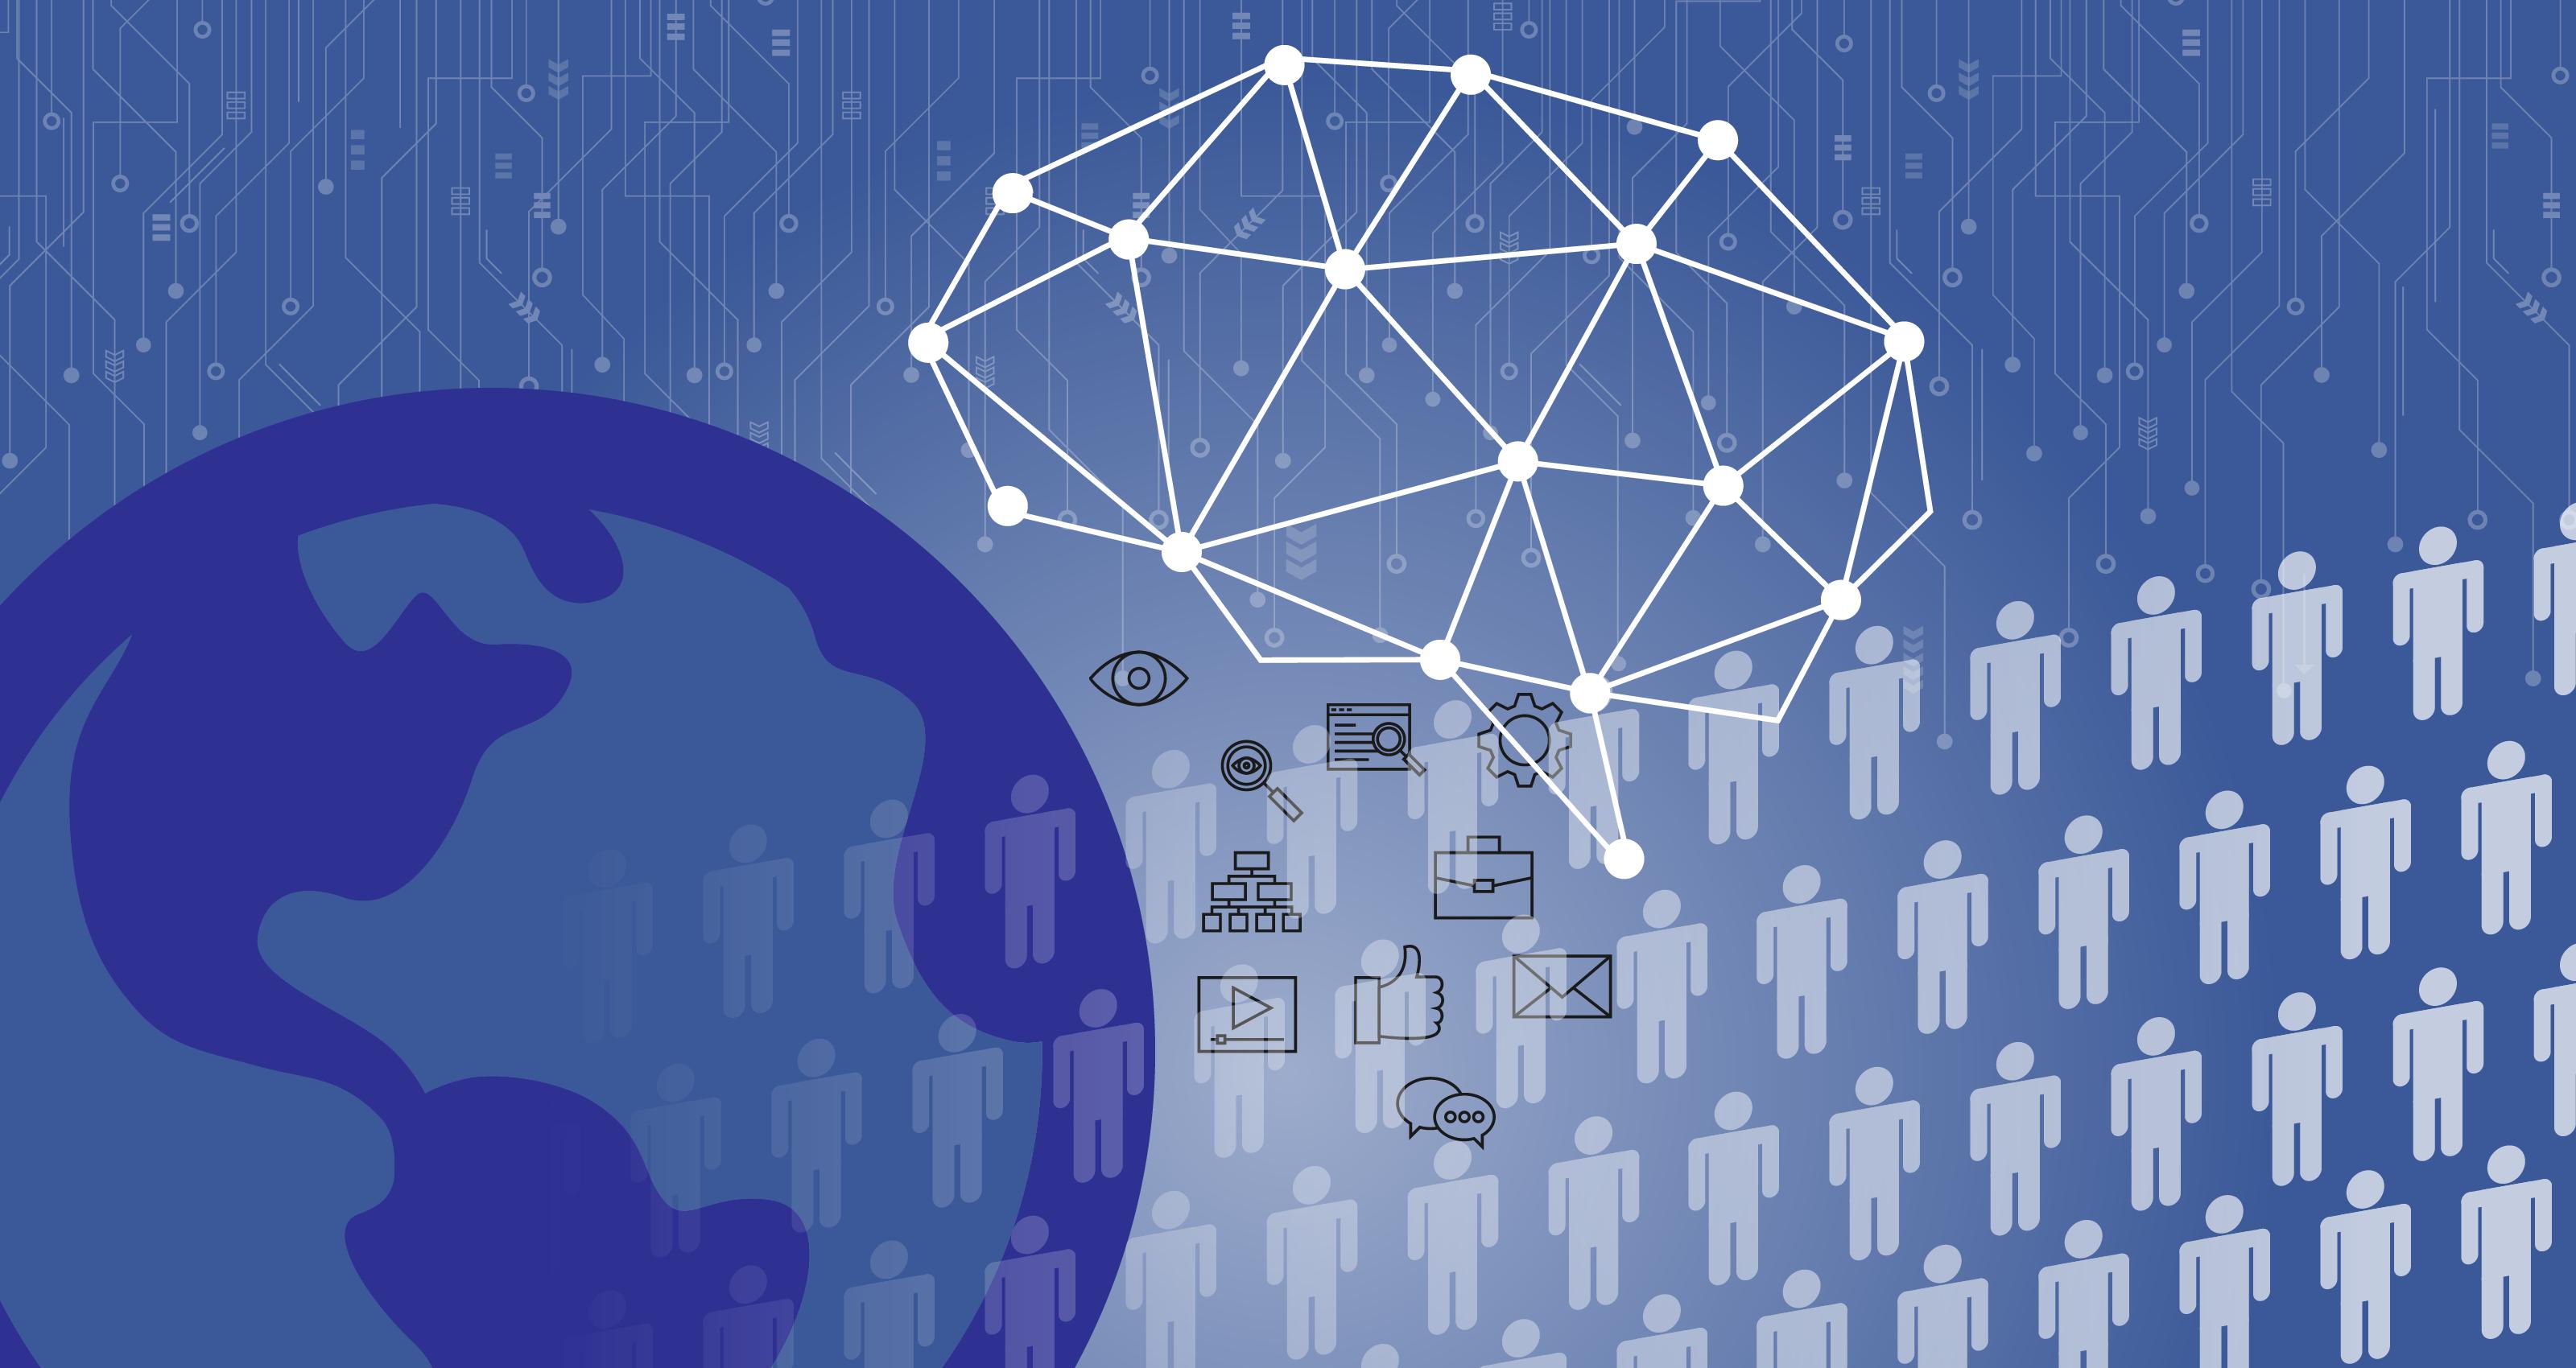 cambridge analytica user data